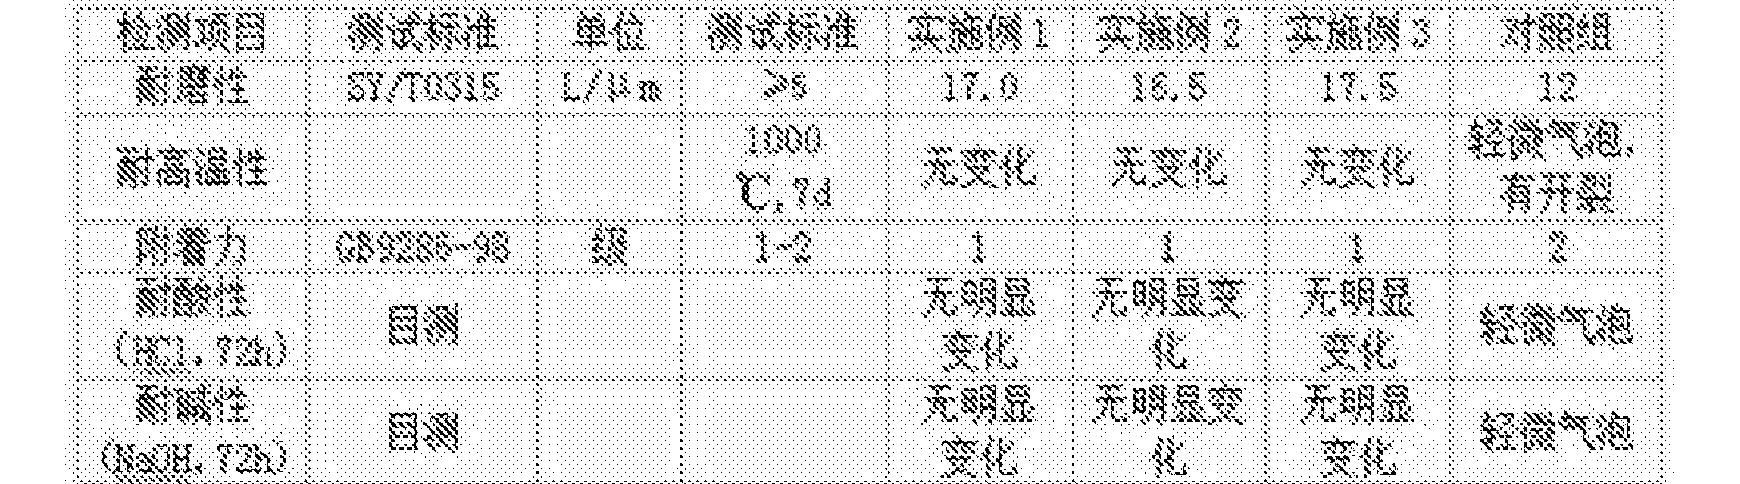 Figure CN107815242AD00061